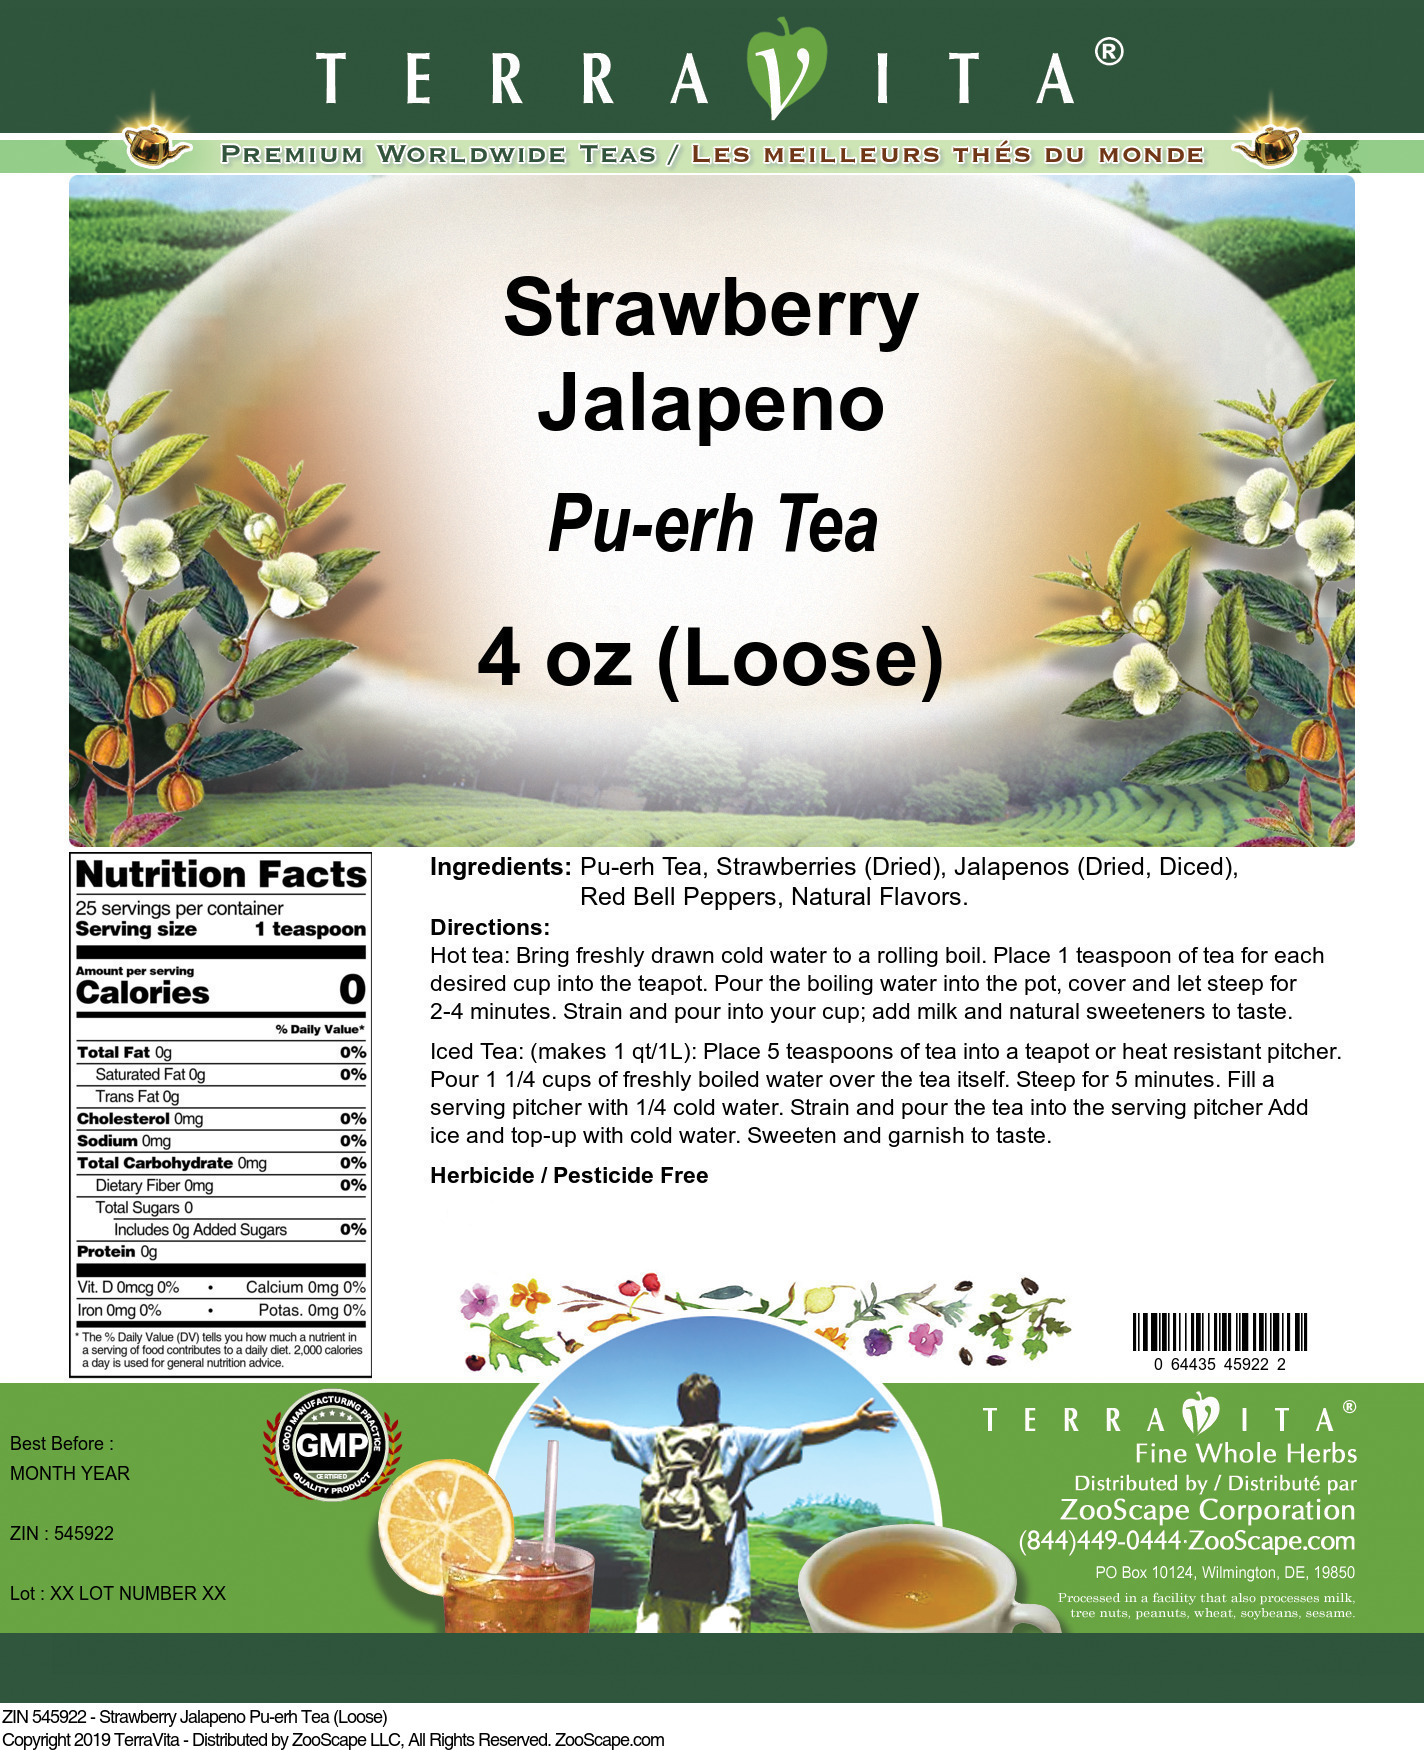 Strawberry Jalapeno Pu-erh Tea (Loose)